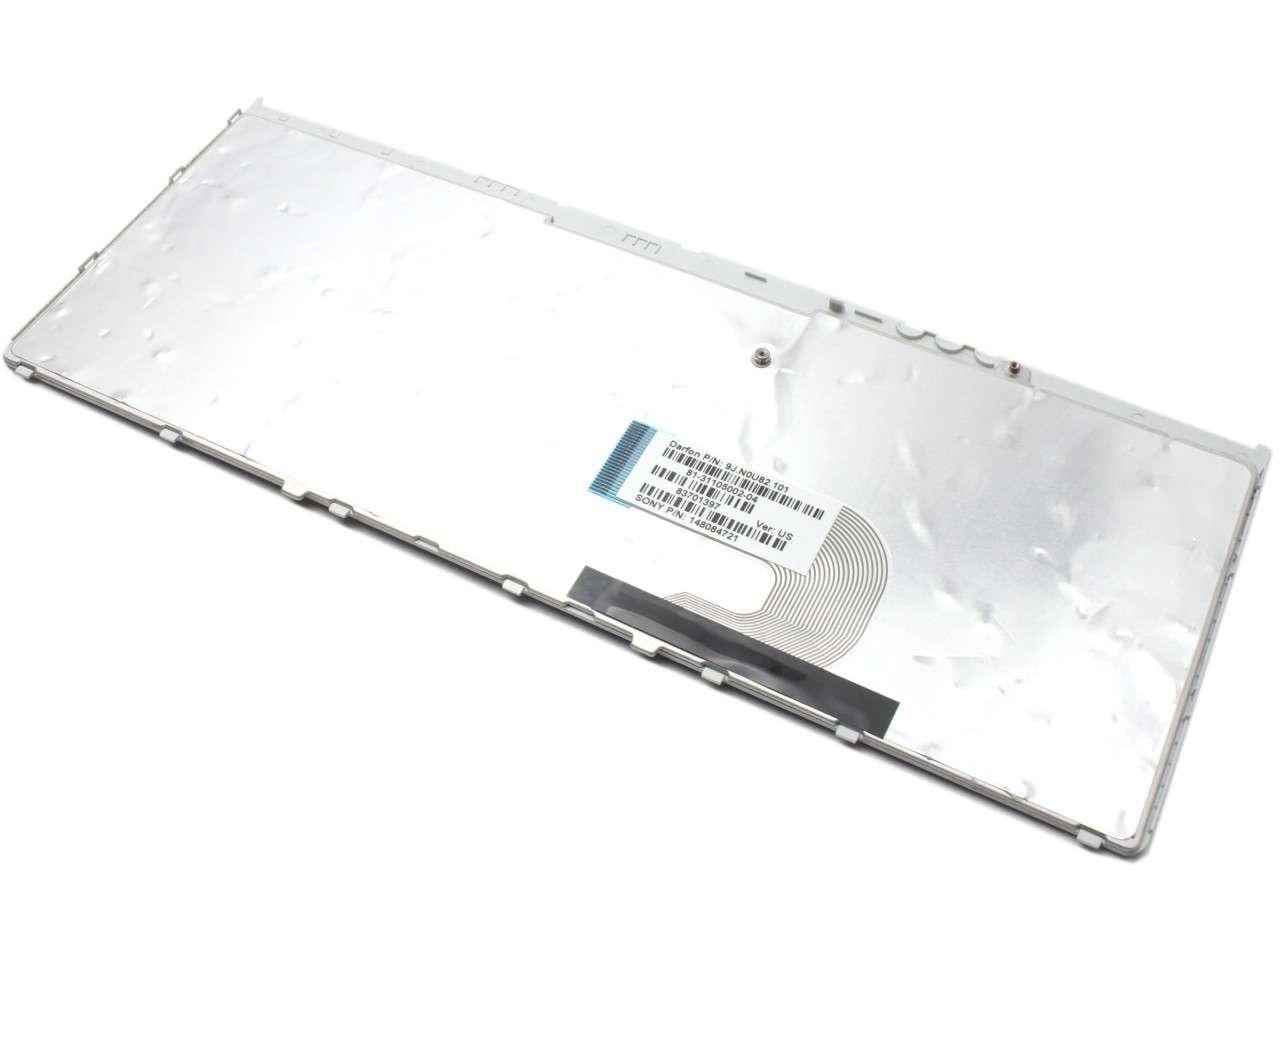 Tastatura Sony Vaio VGN-FW32J neagra cu rama gri imagine powerlaptop.ro 2021